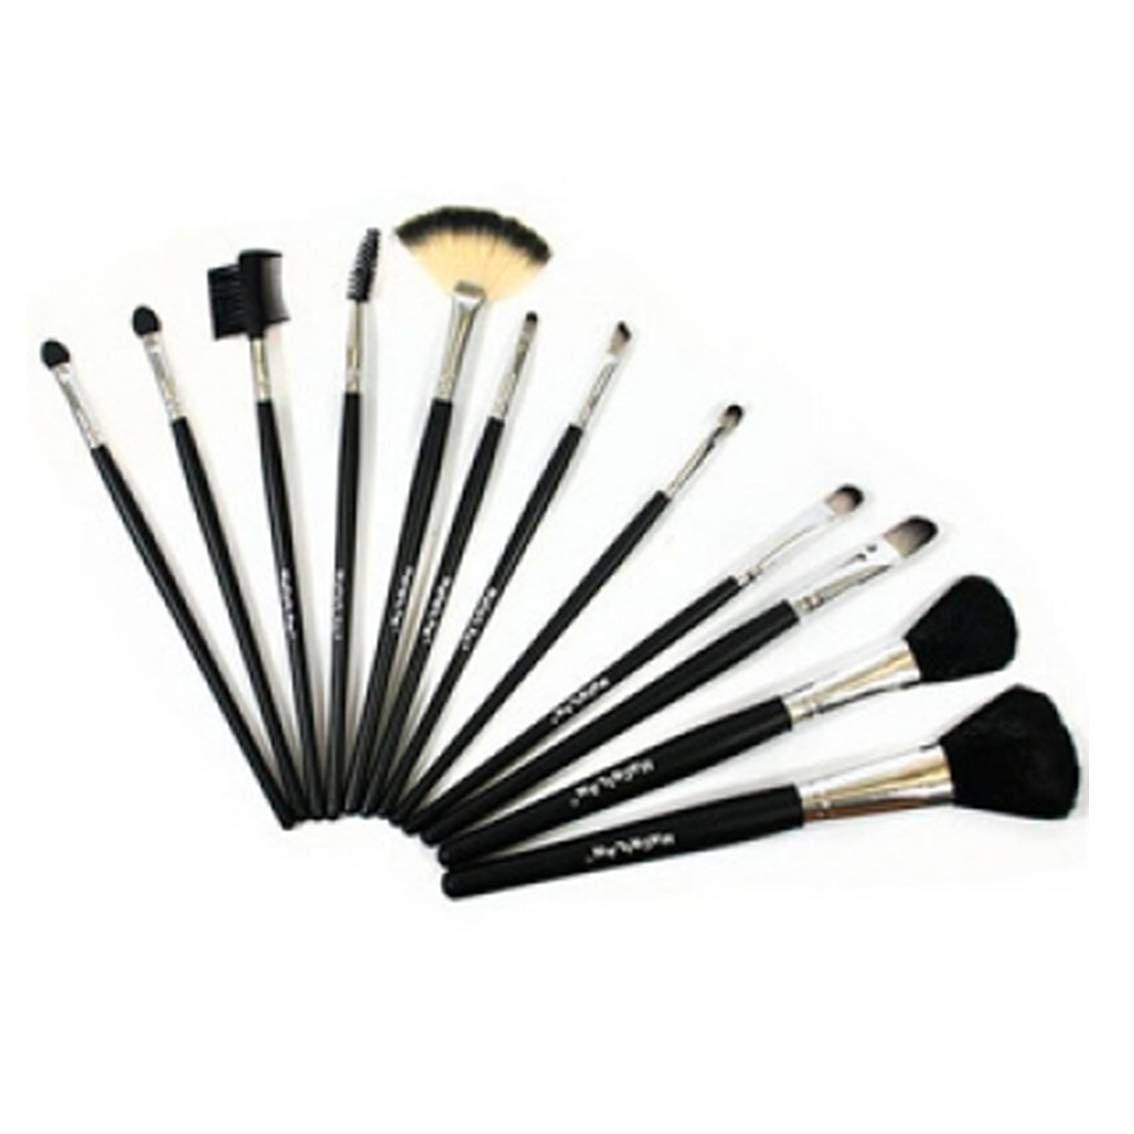 Kit Com 12 Pinceis Profissionais Para Maquiagem - Macrilan